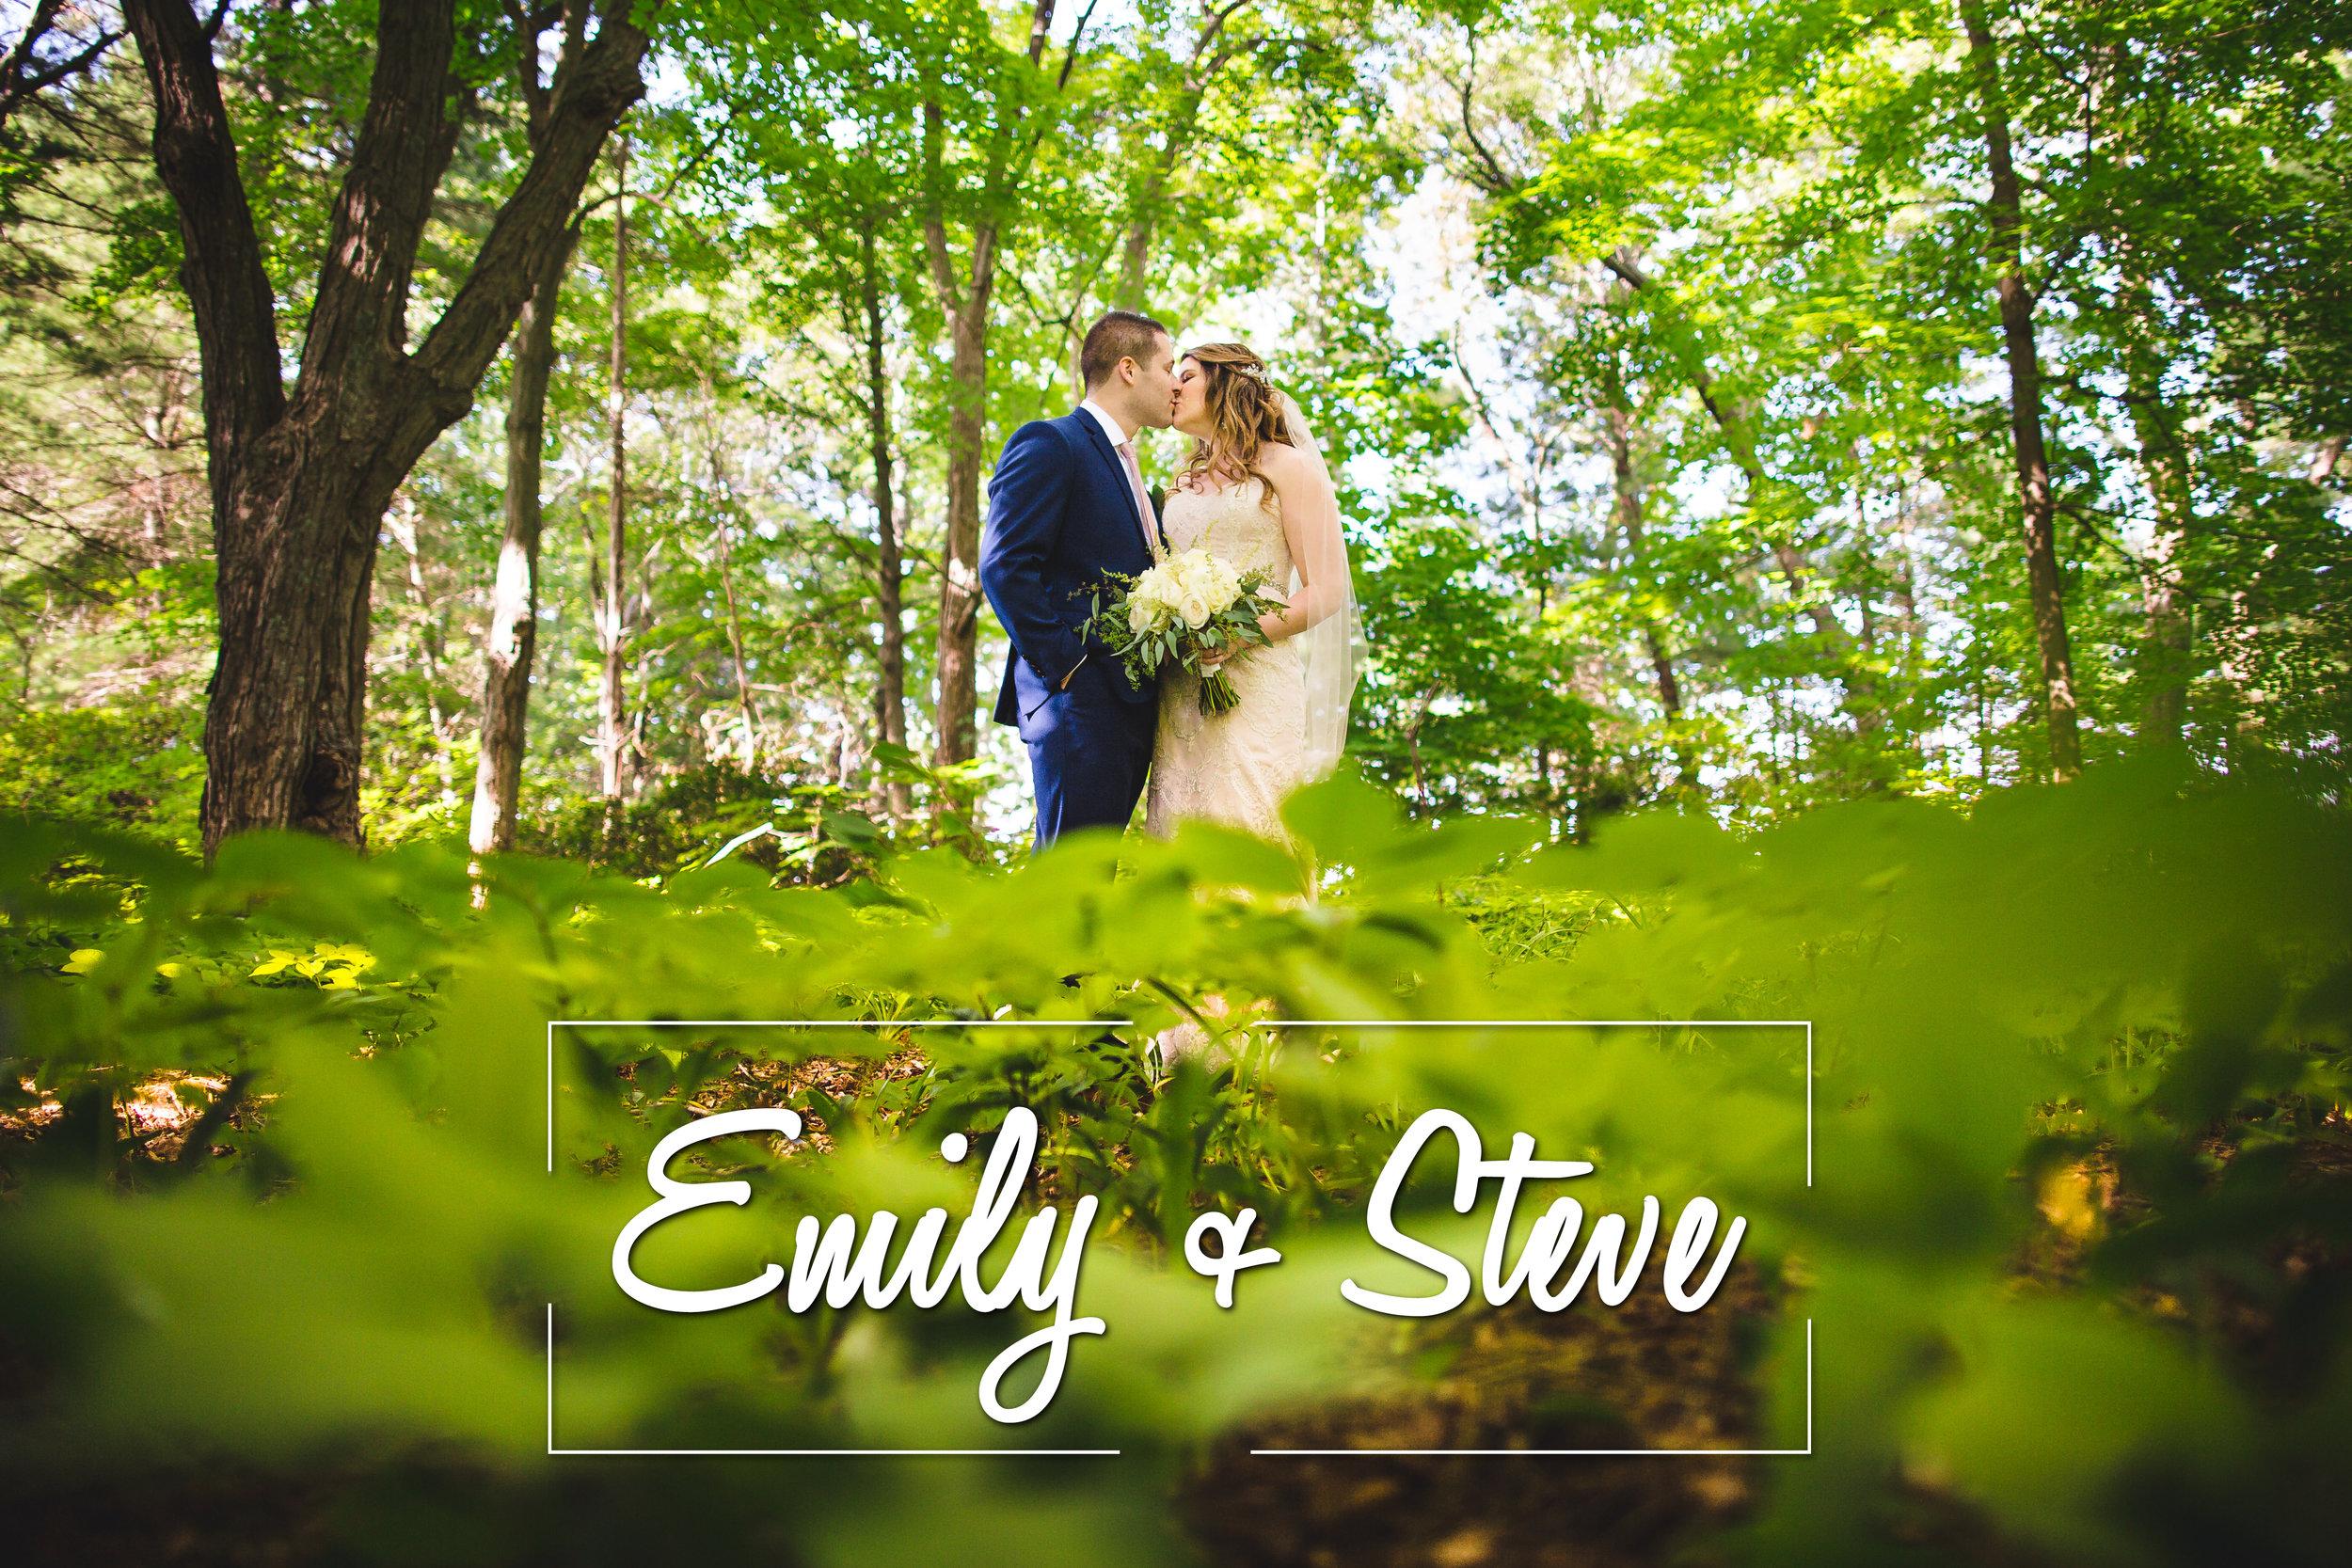 577-Emily&Steve_blogcouplessession-DC6B1672 copy.jpg